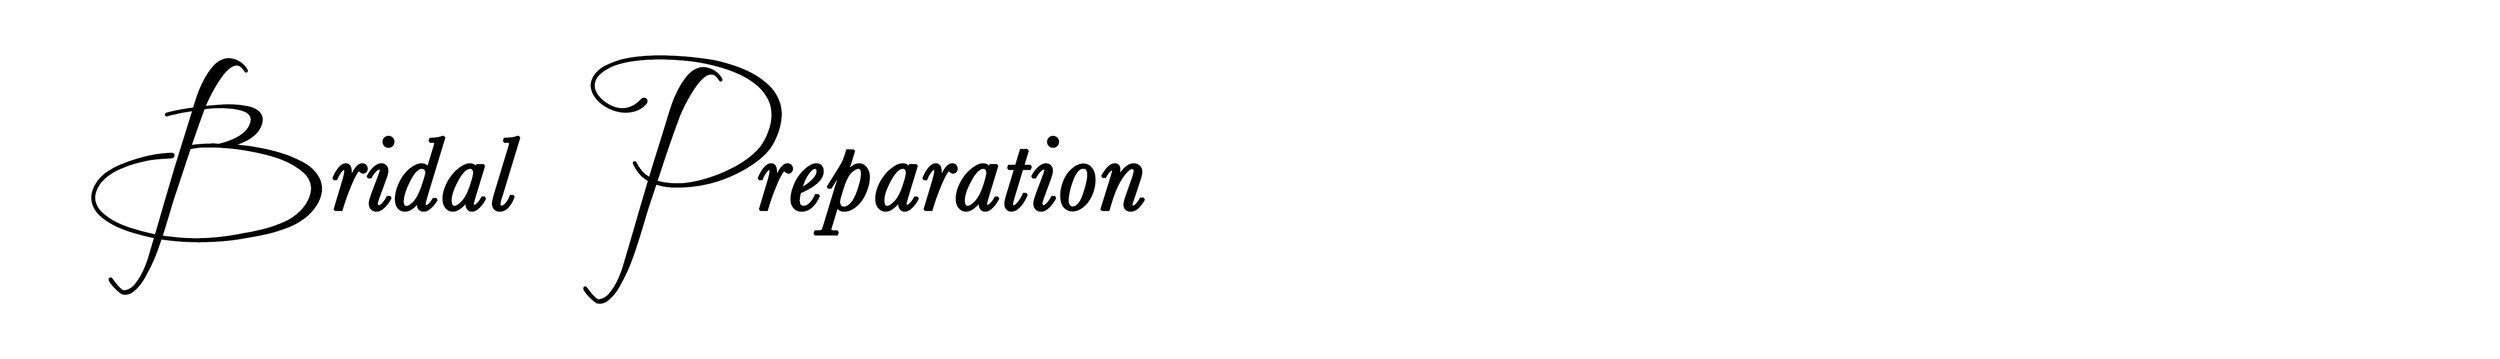 Typo_BridalPreparation3.jpg